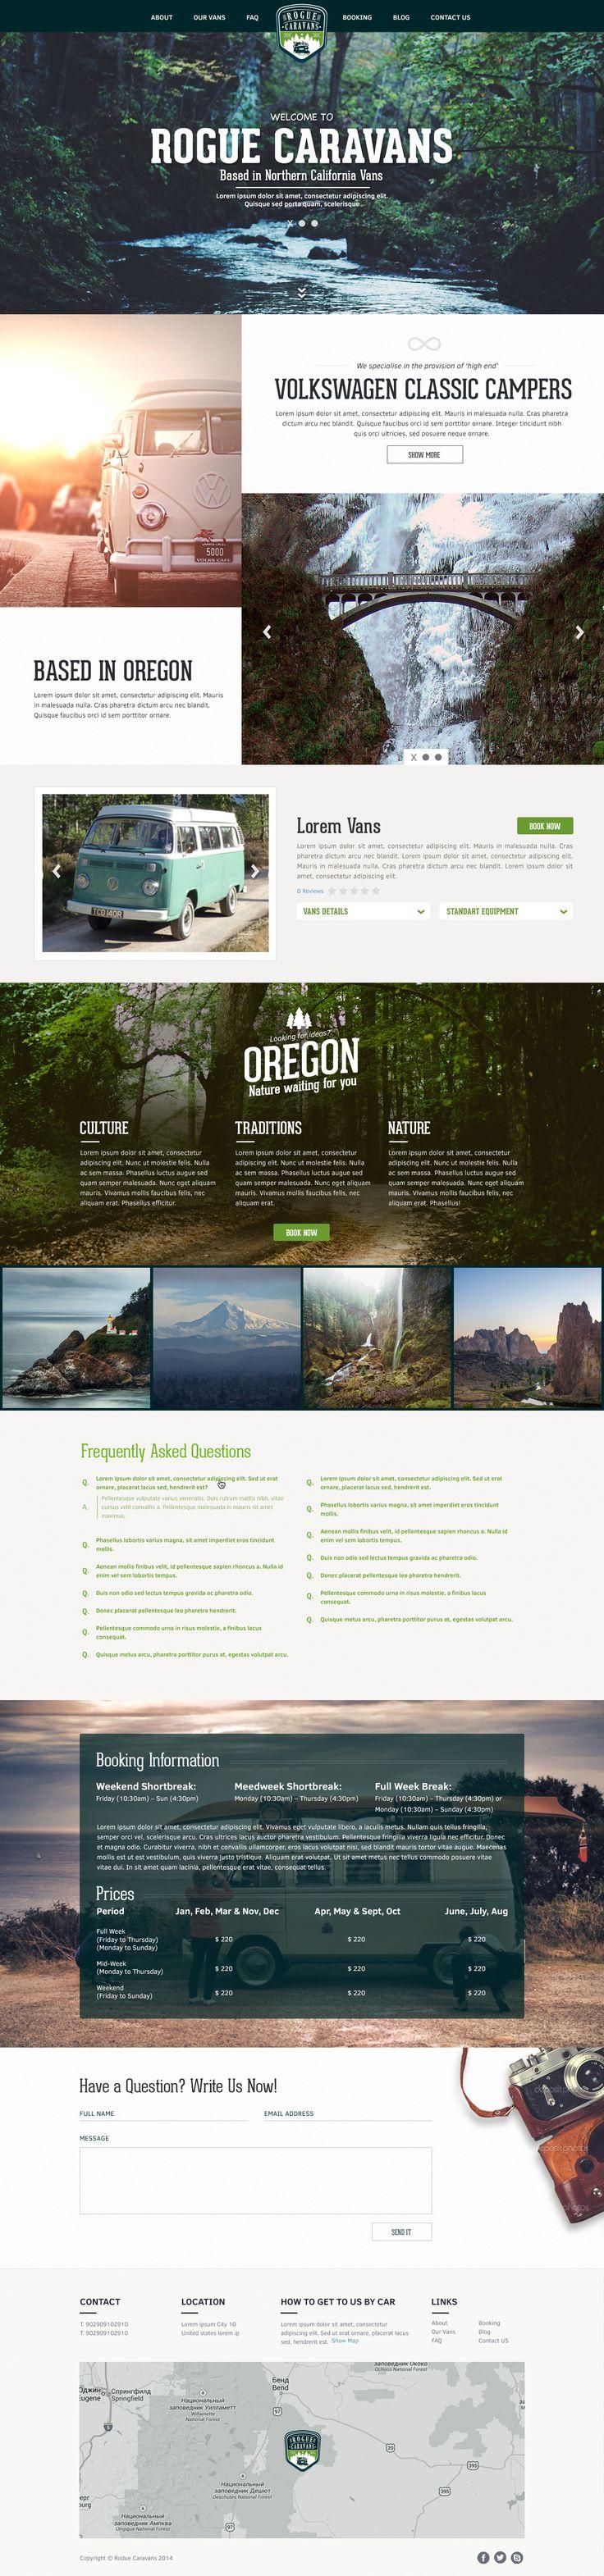 Caravan Web Design by Alex Cross on 99Designs